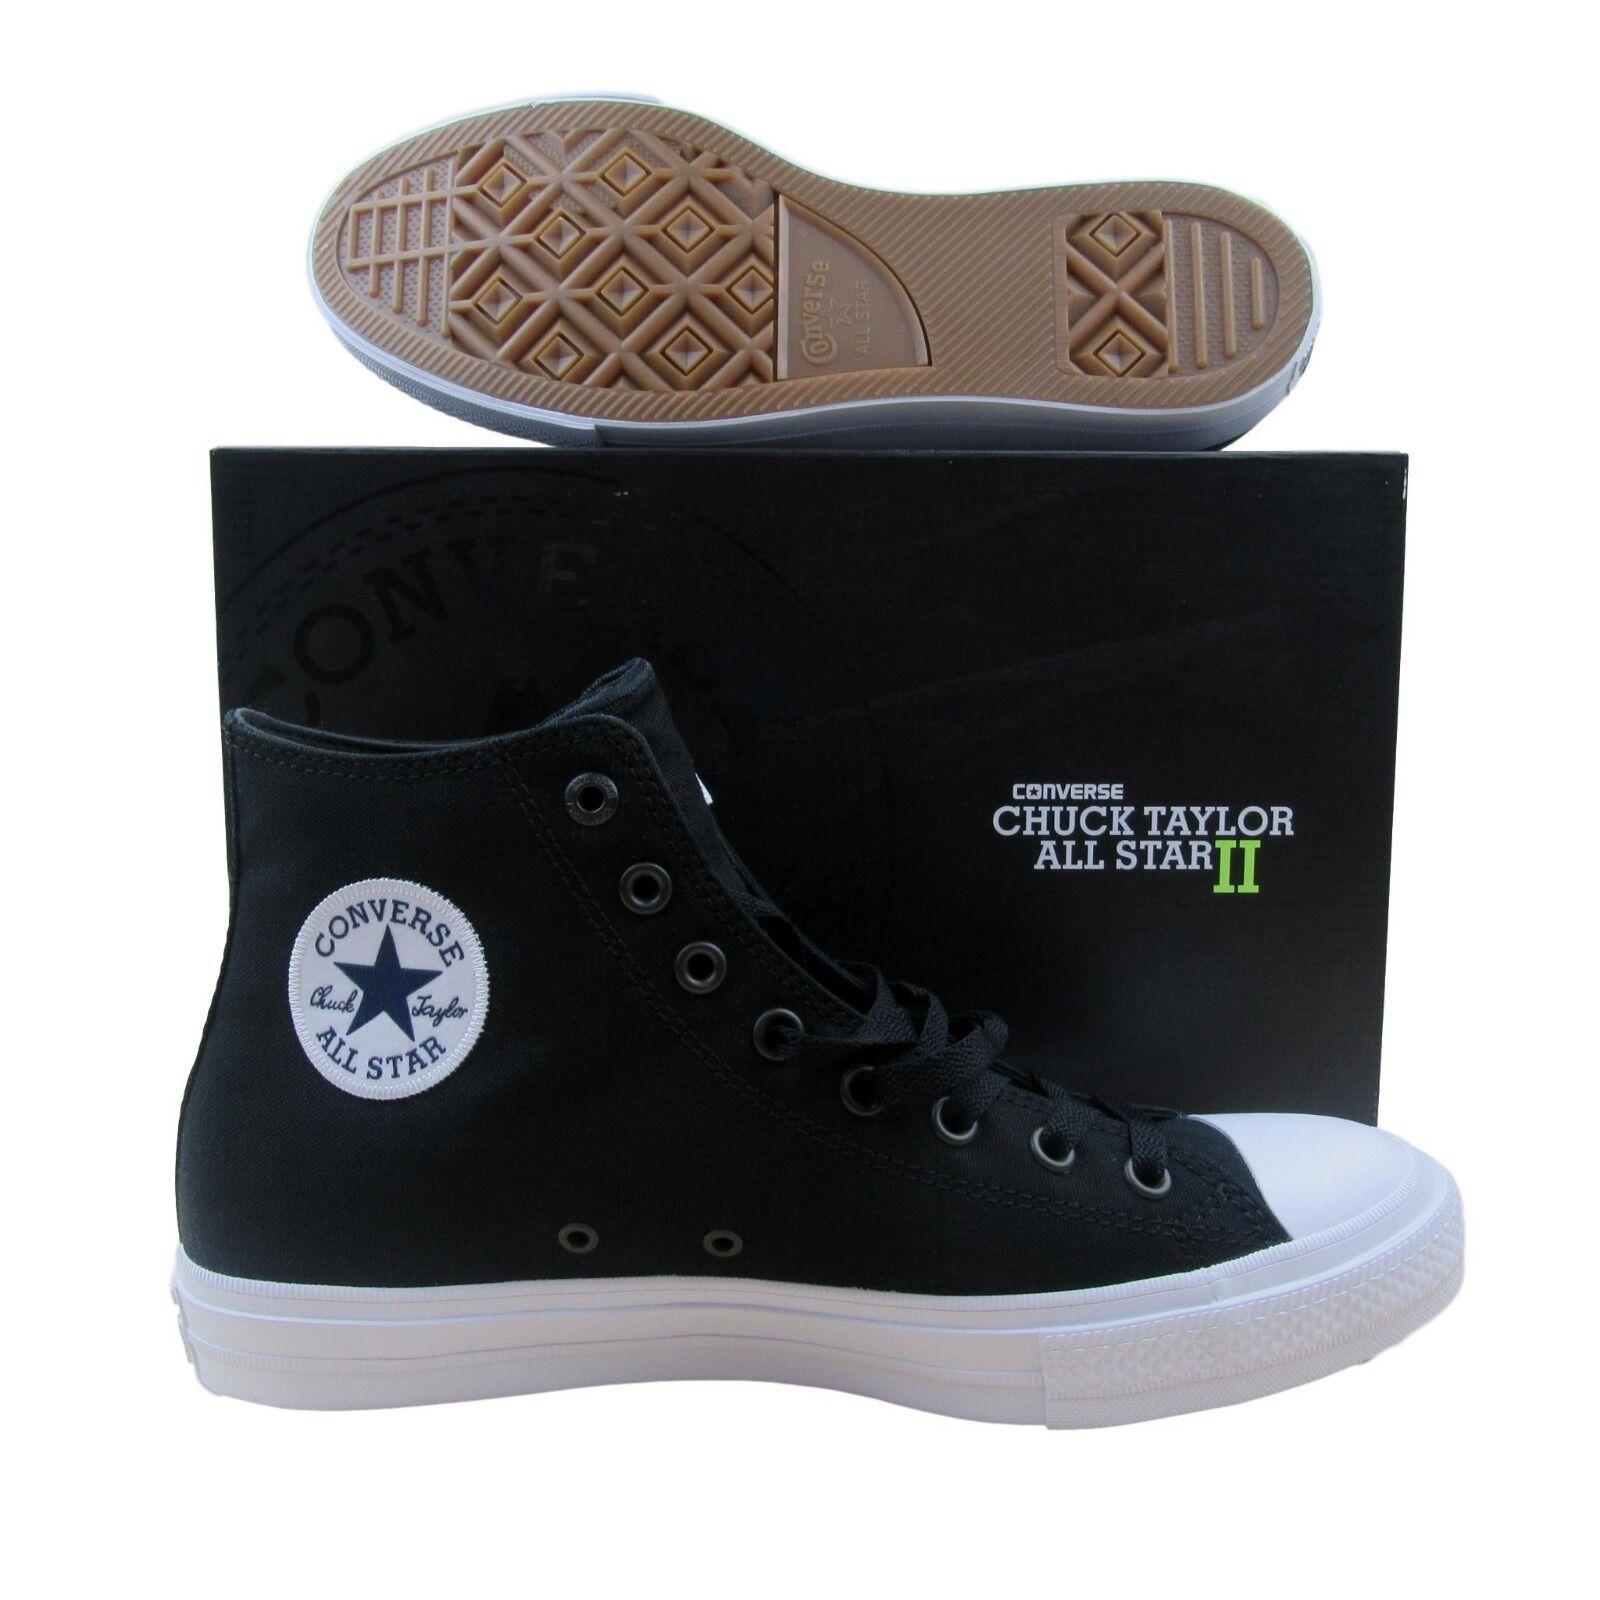 Converse Chuck Taylor All Star II Hi Shoes Lunarlon Black 15